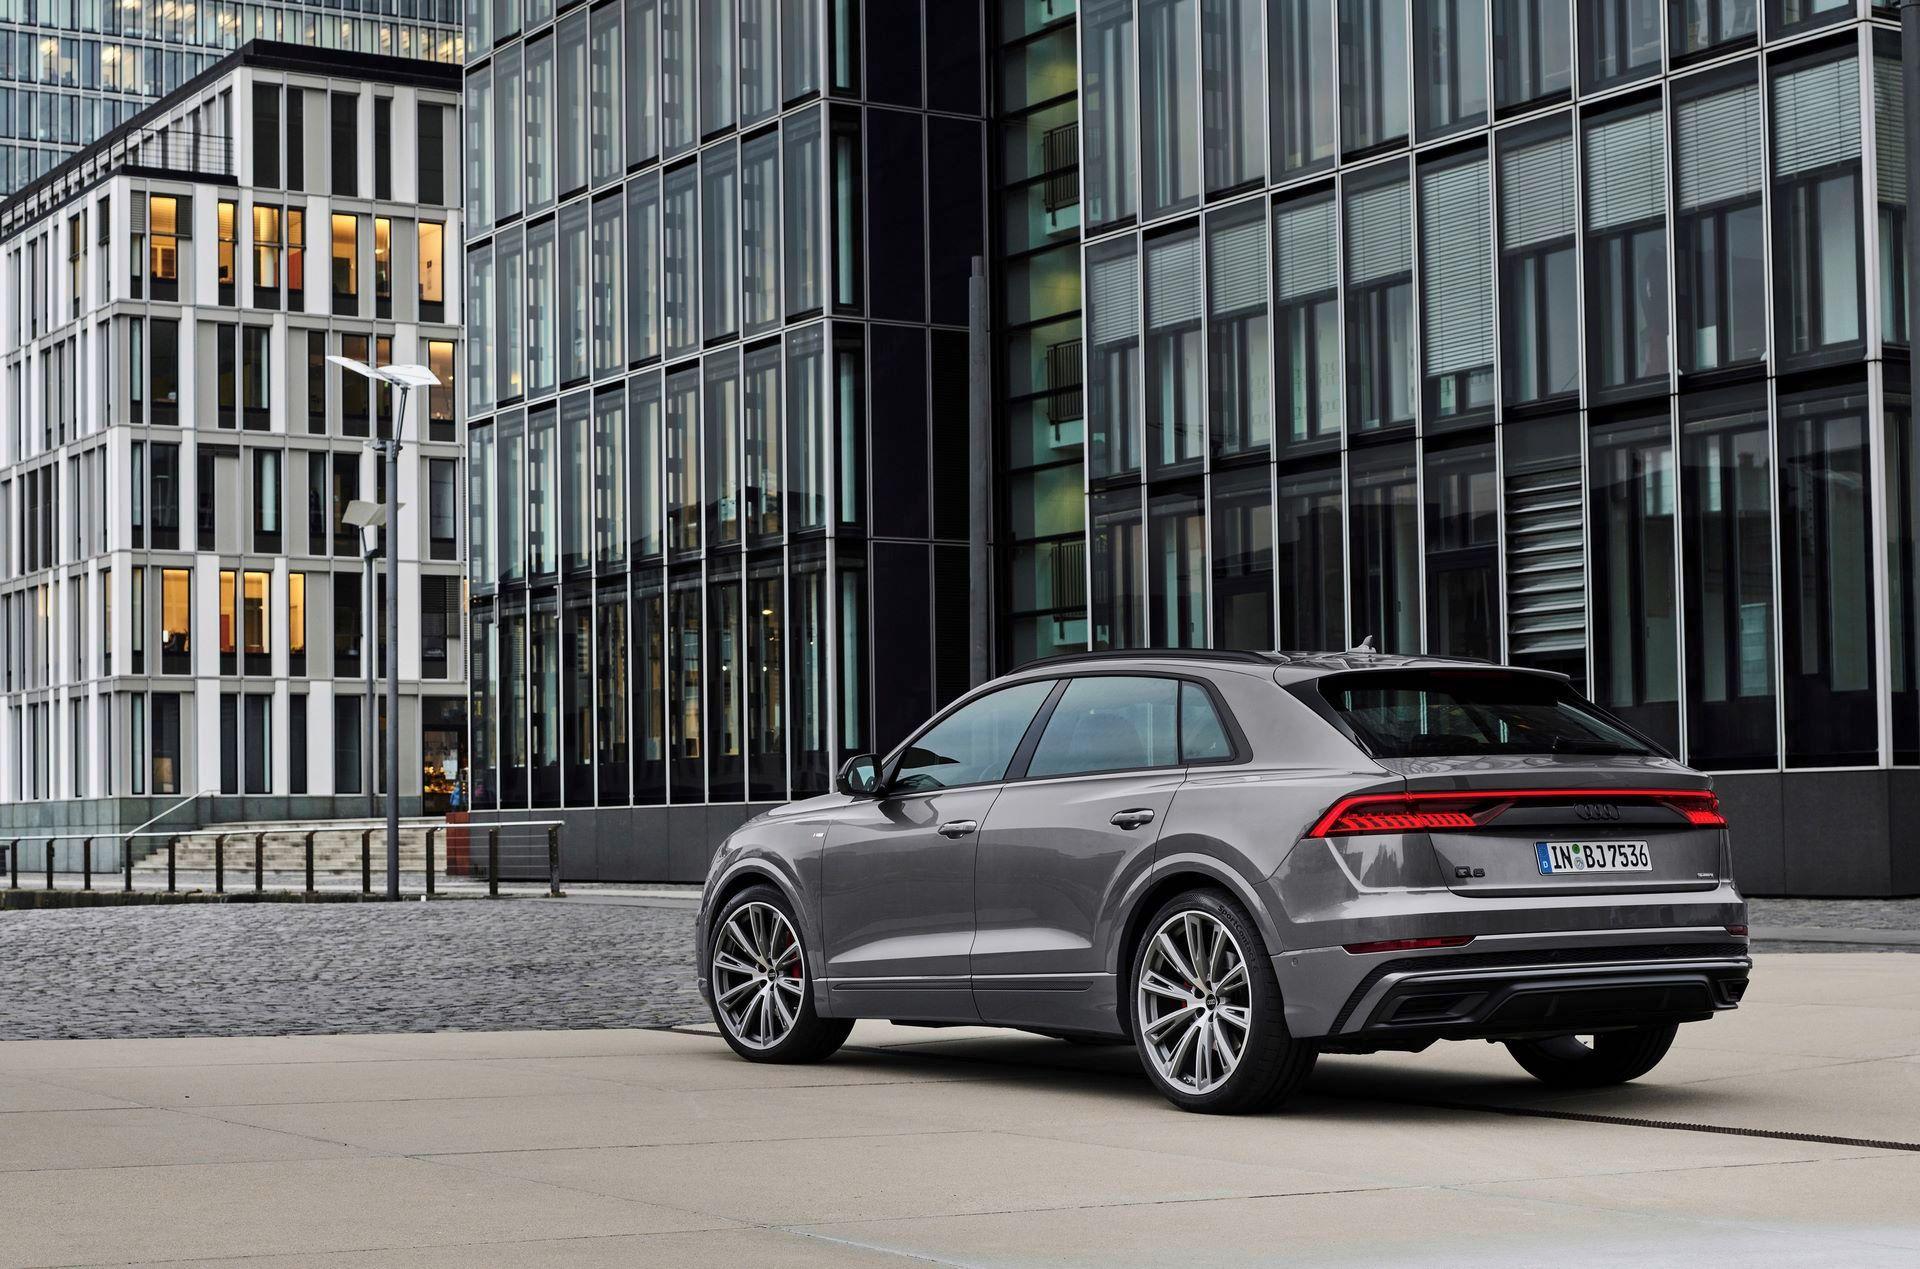 Audi-A4-A5-Q7-Q8-Competition-And-Competition-Plus-Trims-8